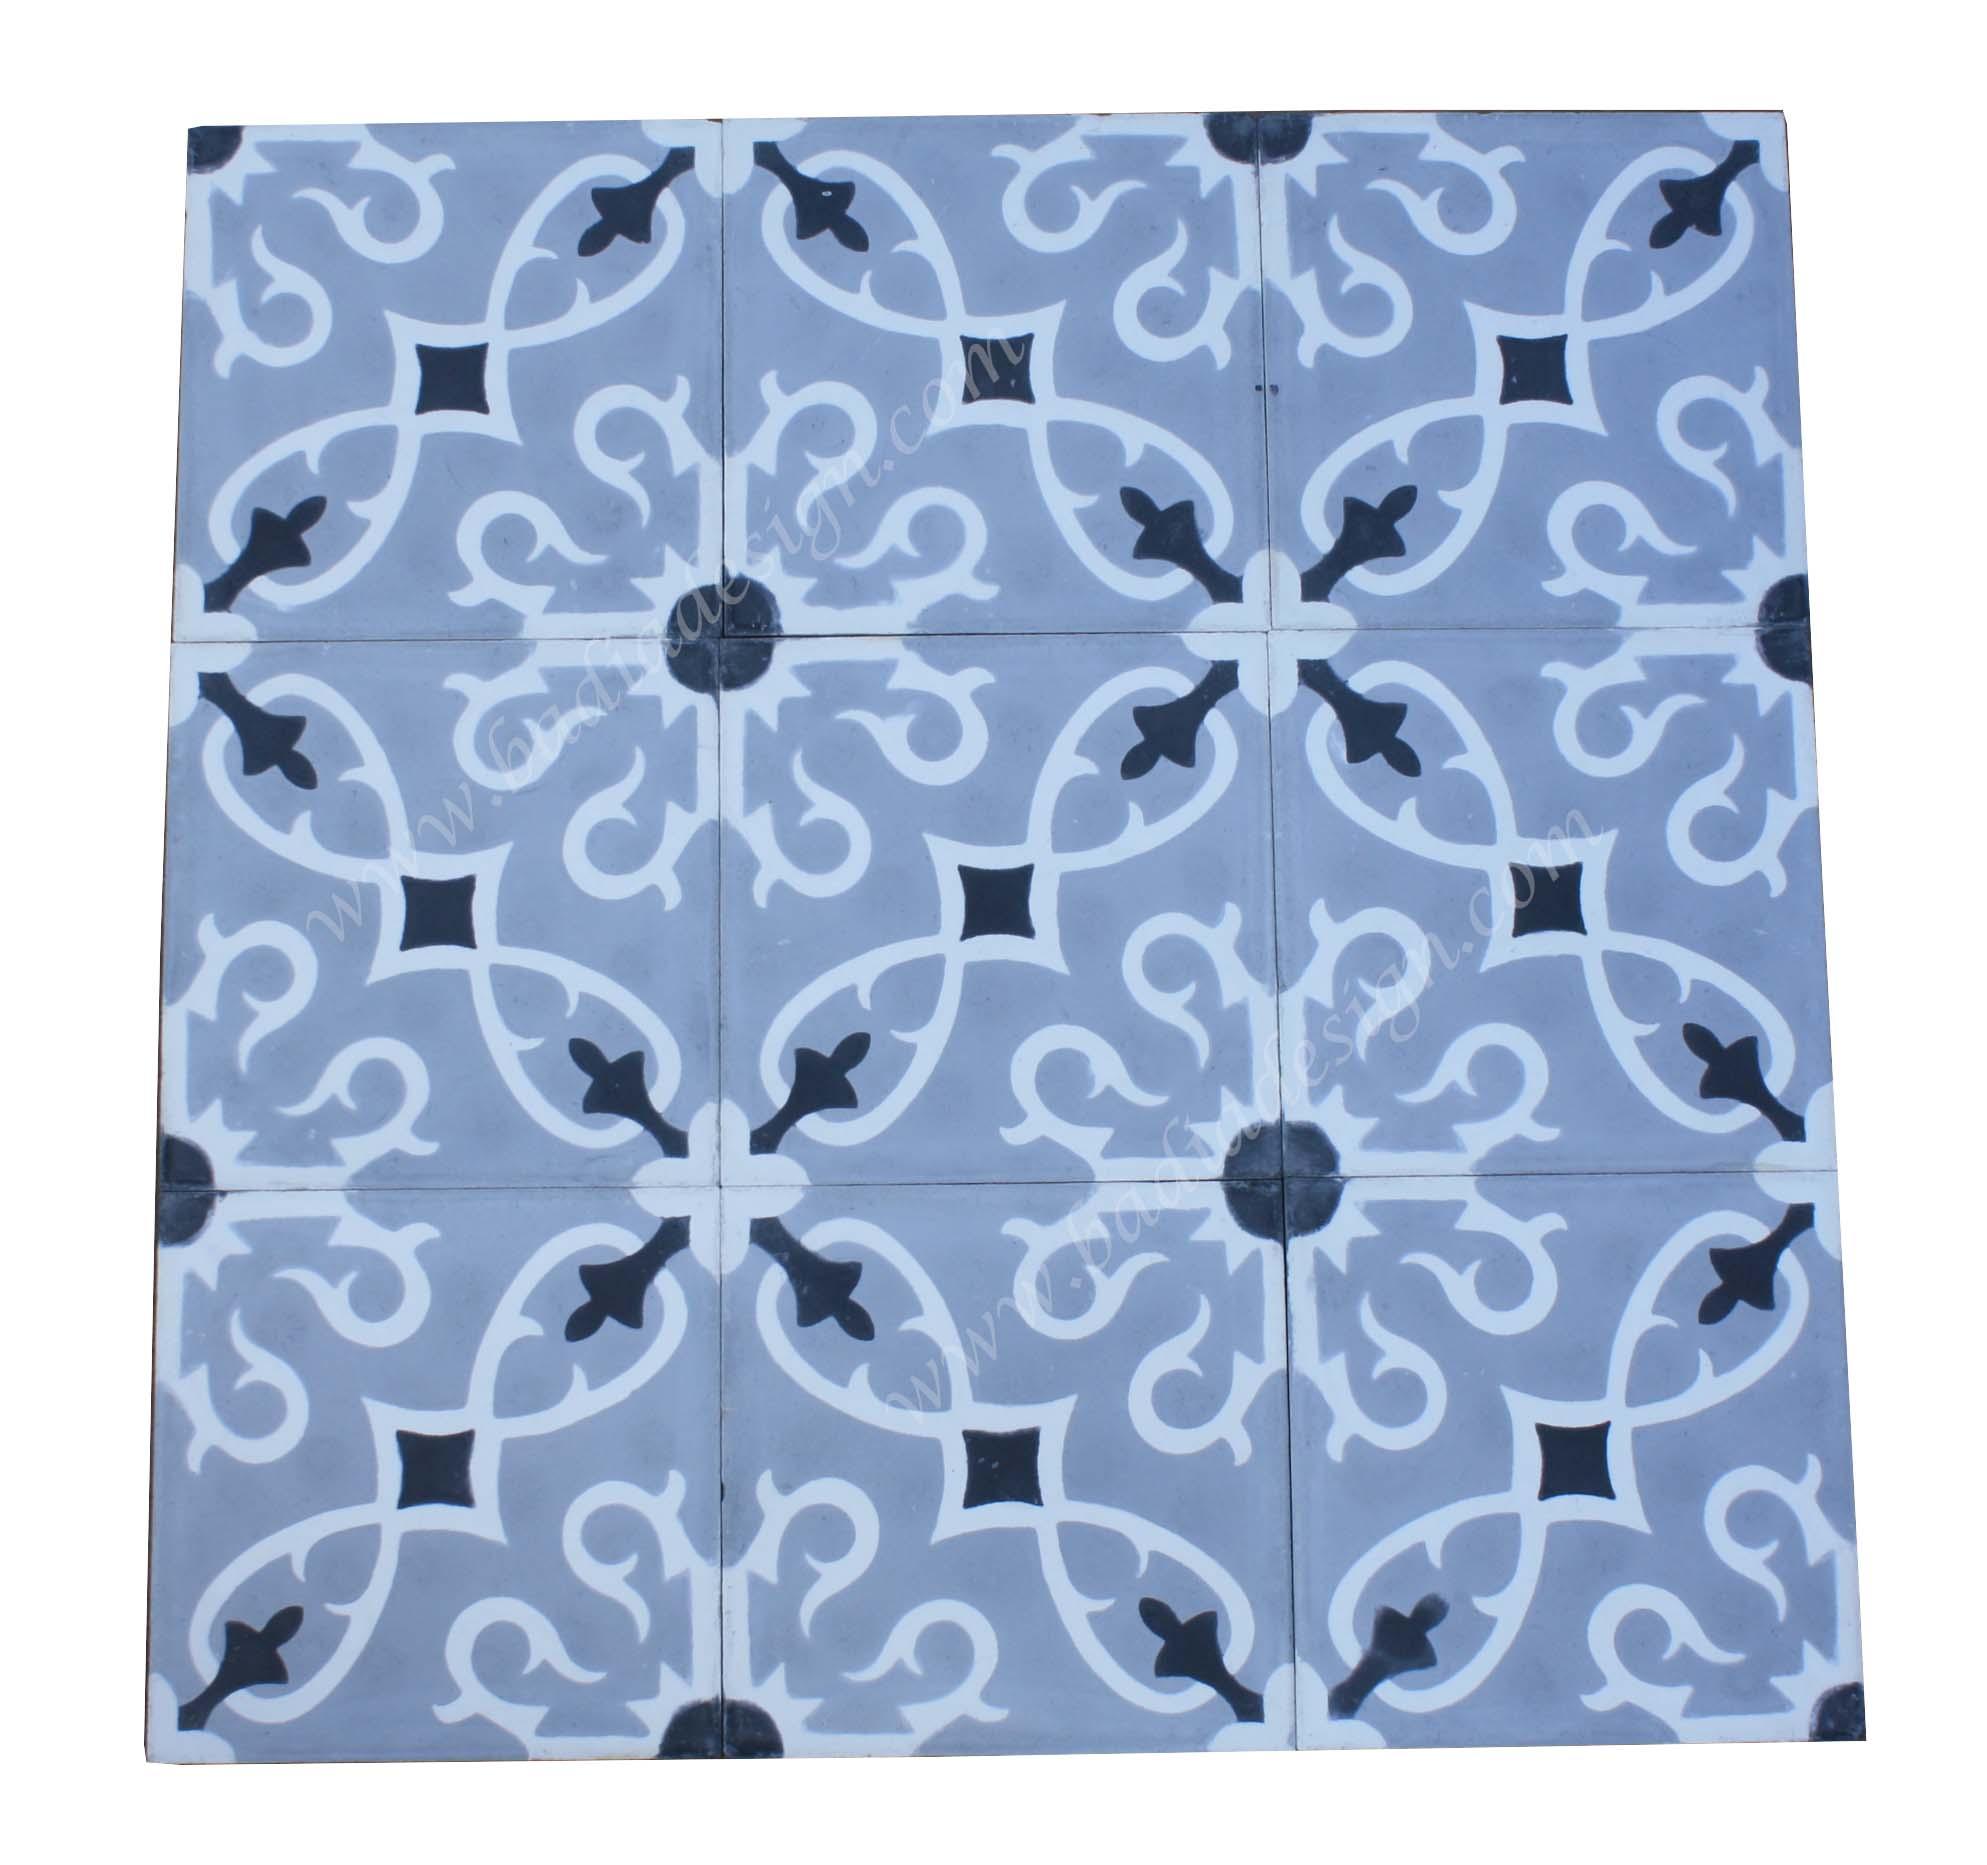 medina-handmade-cement-tile-ct091-1.jpg